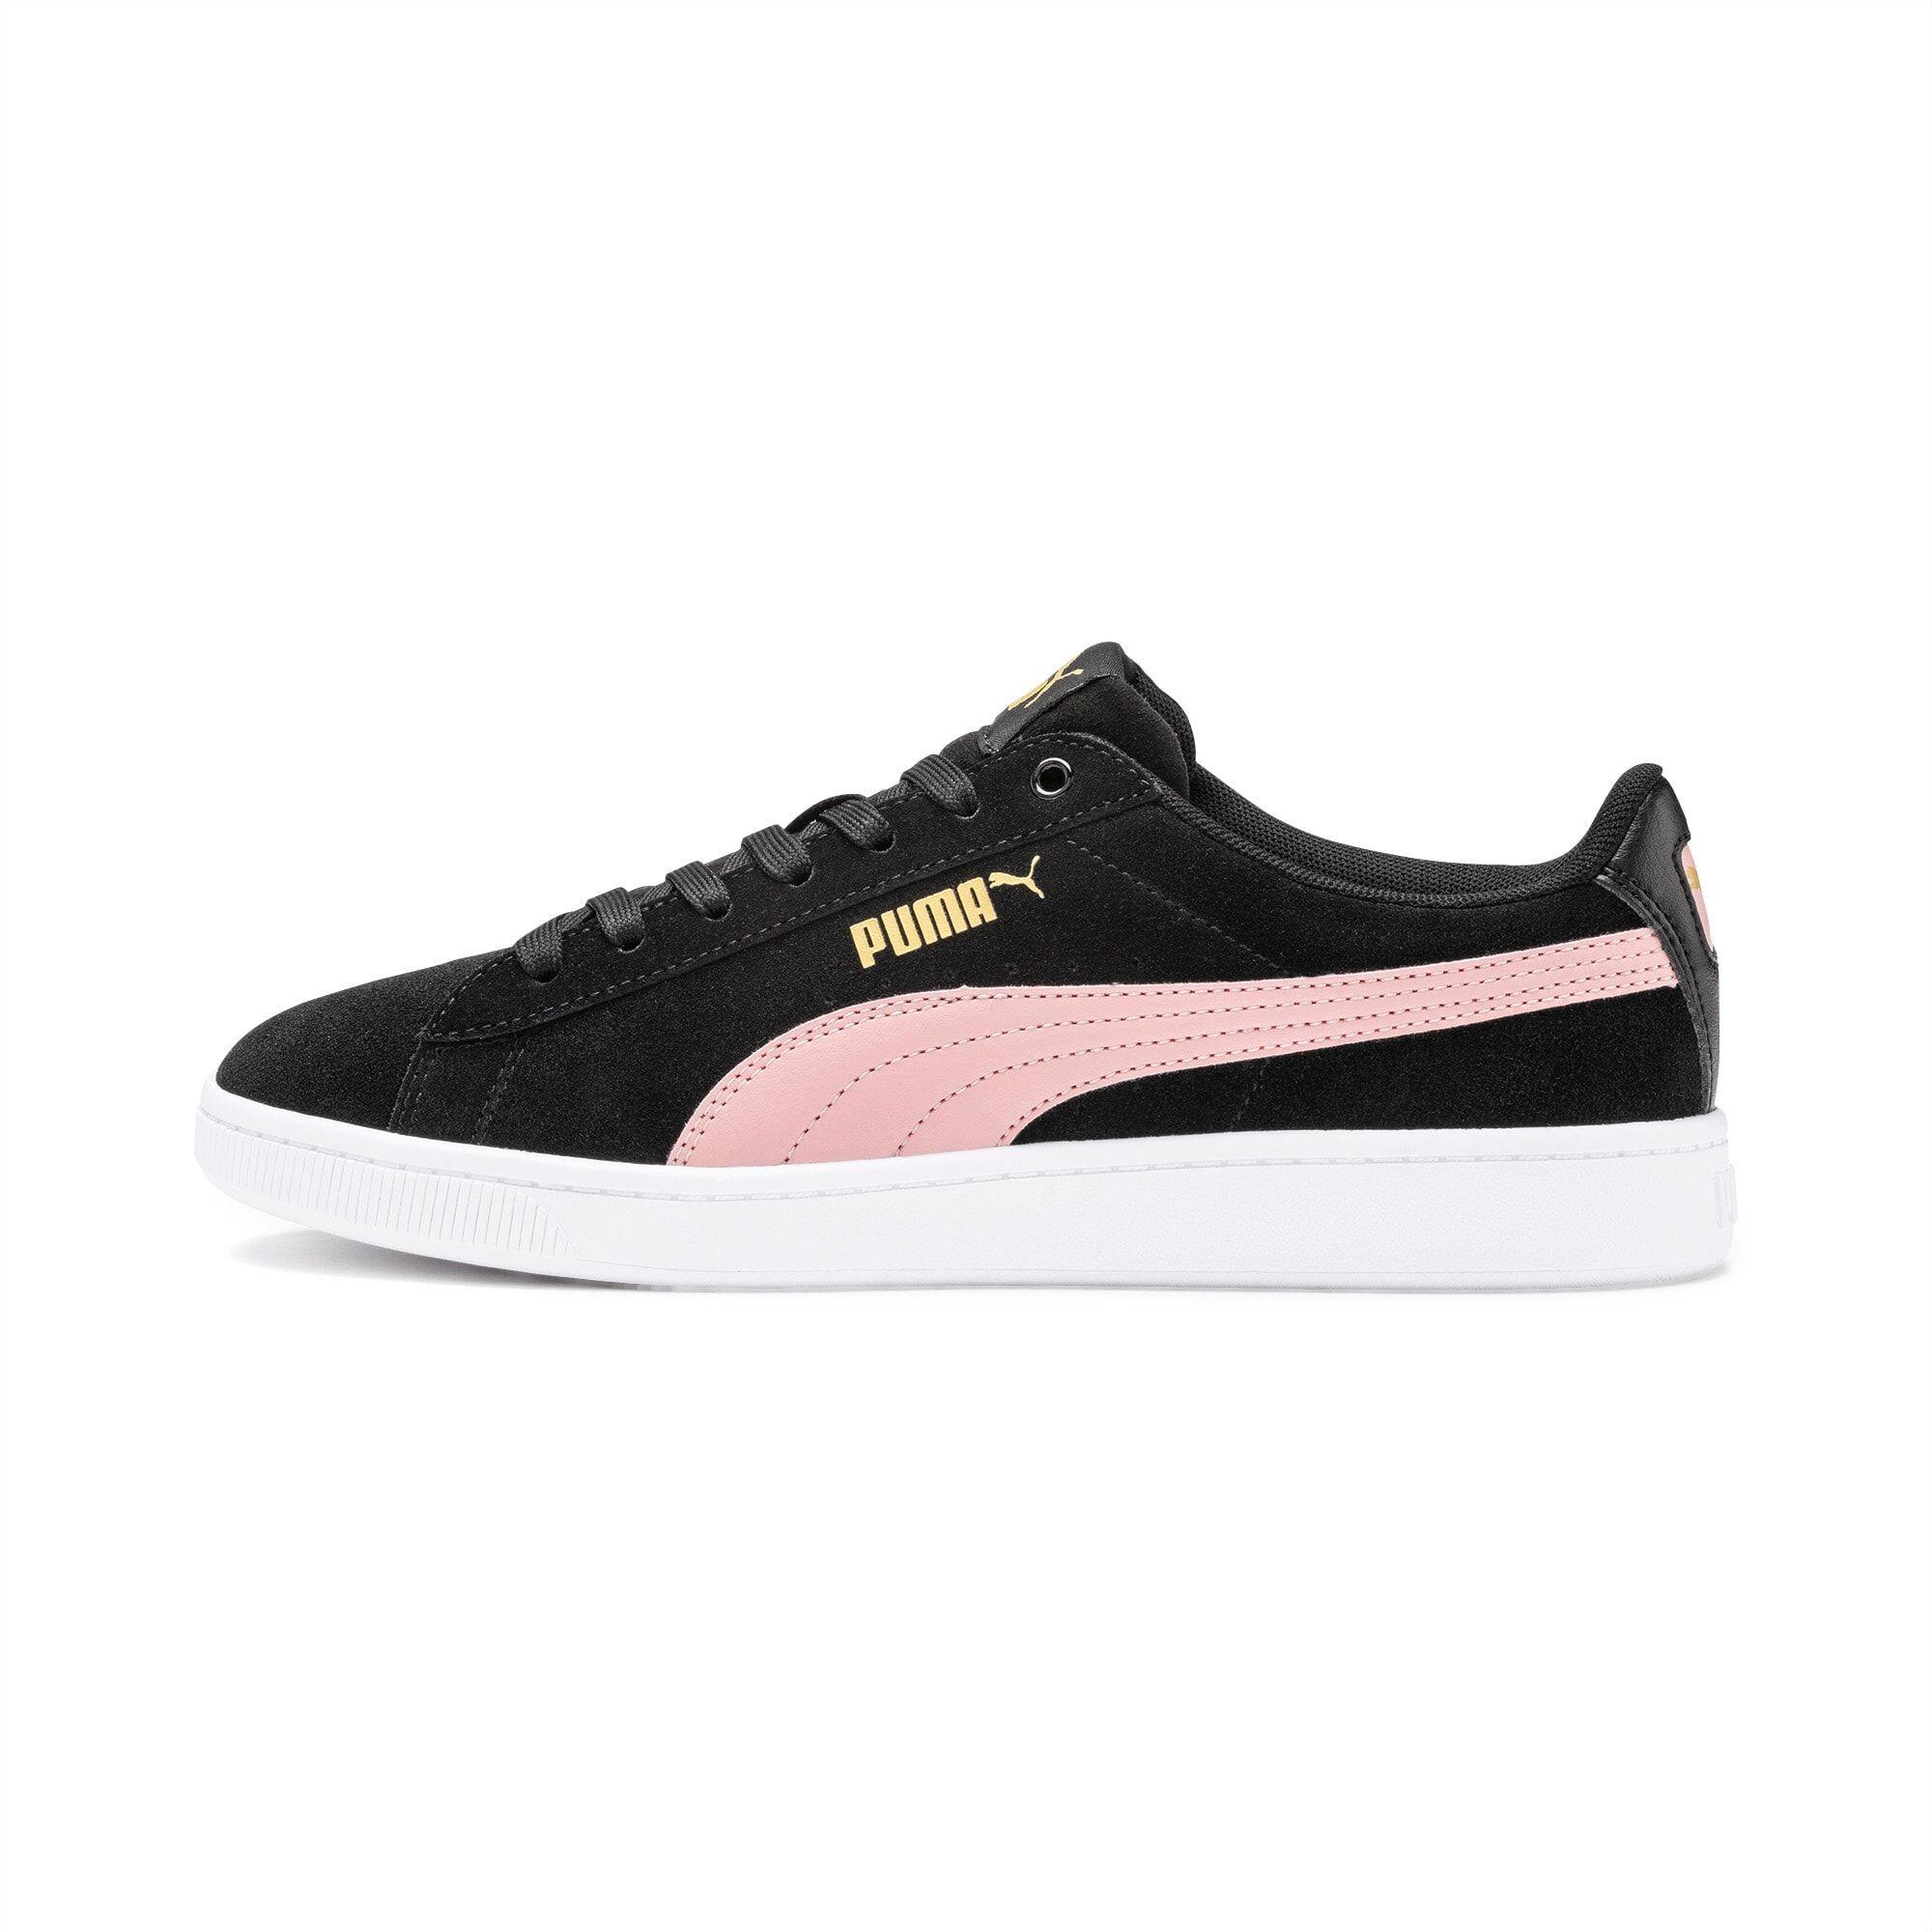 PUMA Chaussure Basket Vikky v2 pour Femme, Blanc/Rose/Noir, Taille 38, Chaussures